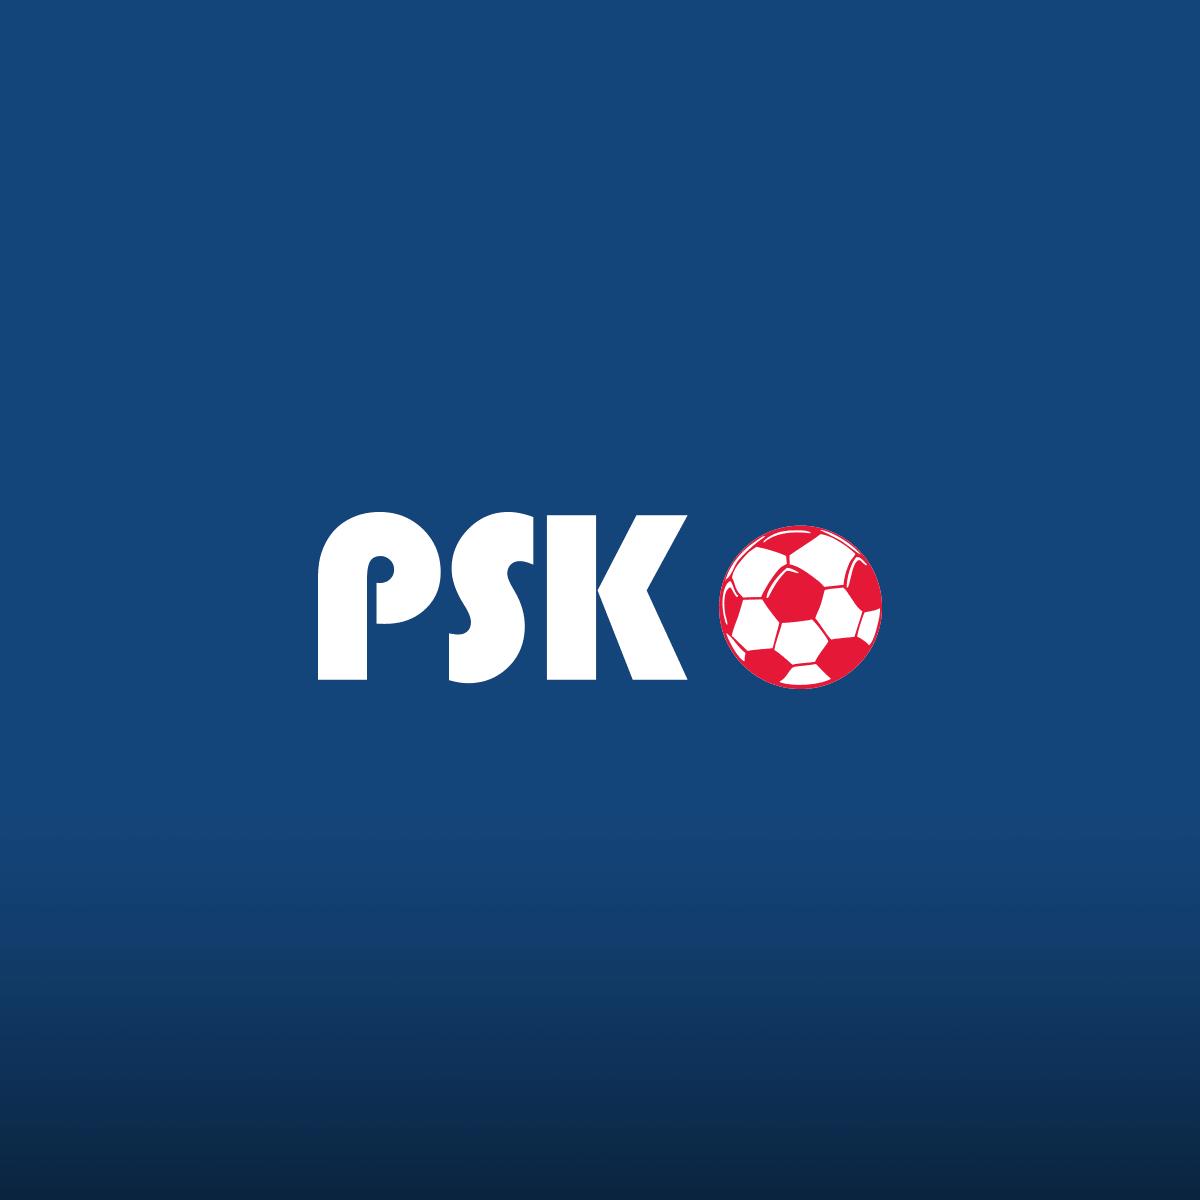 Casino PSK image